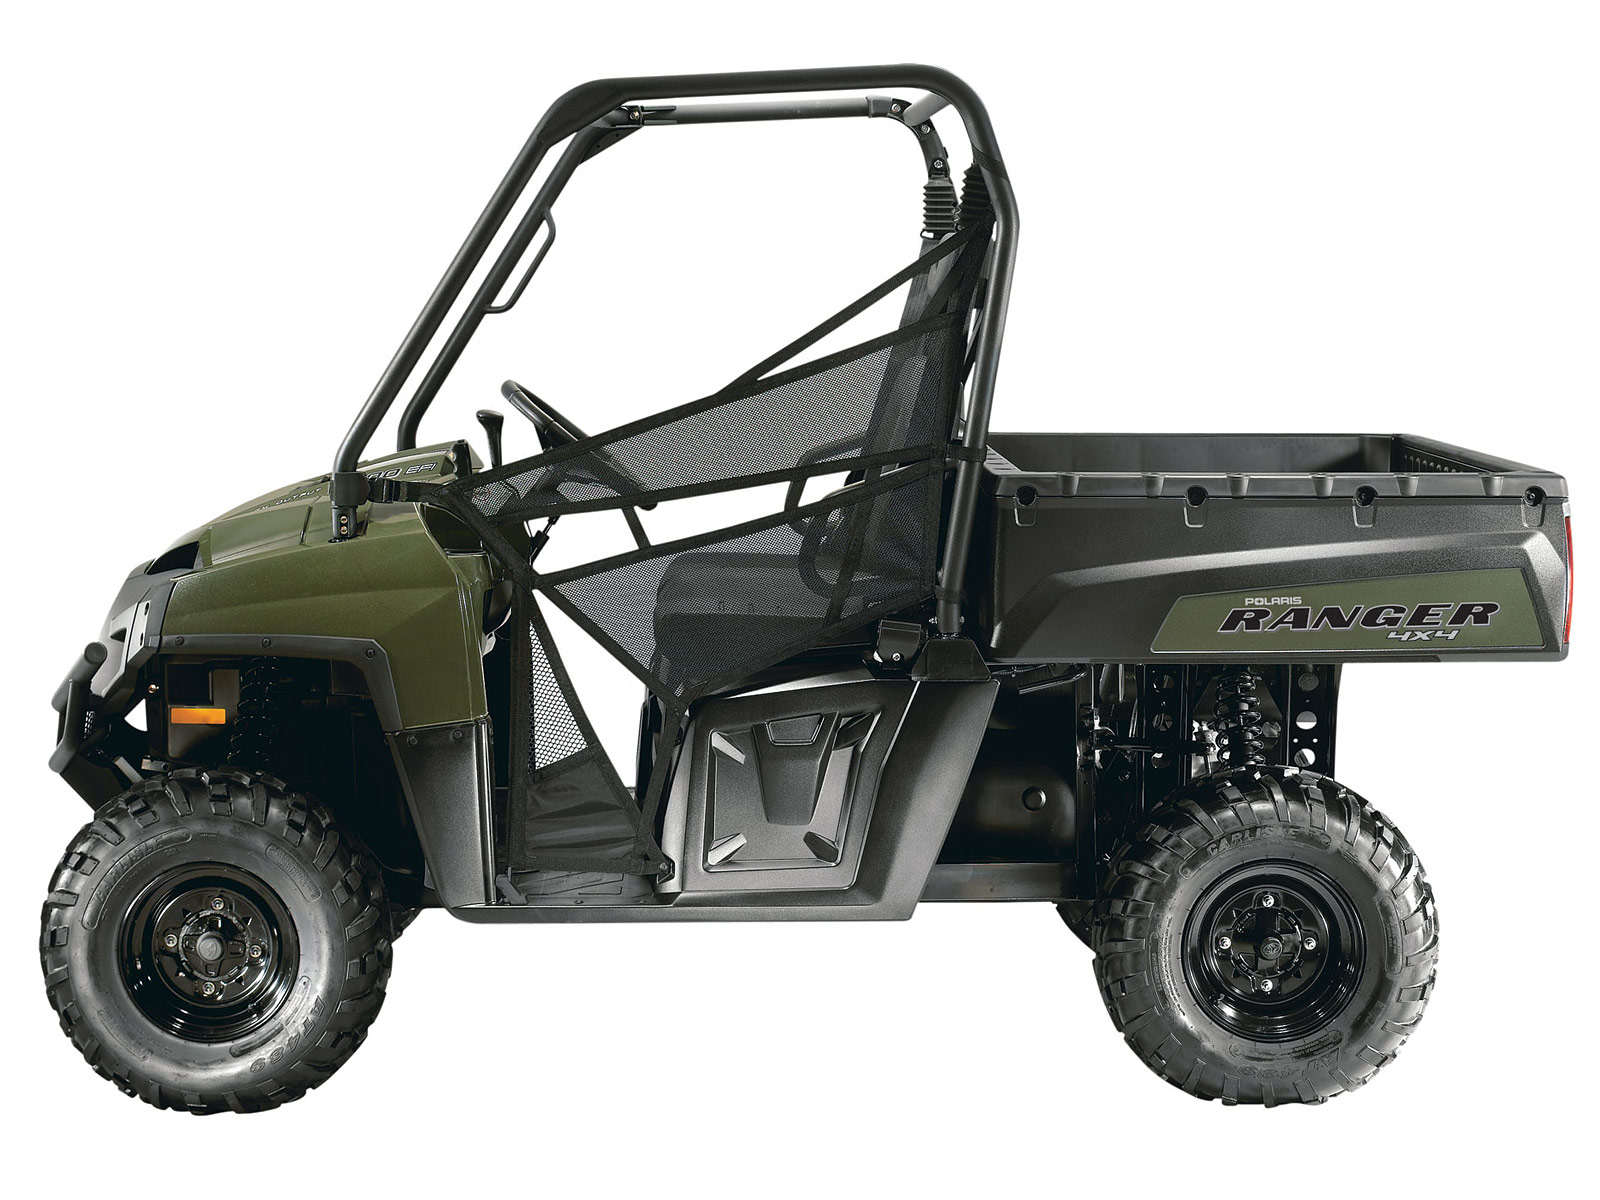 Suzuki Utv Models